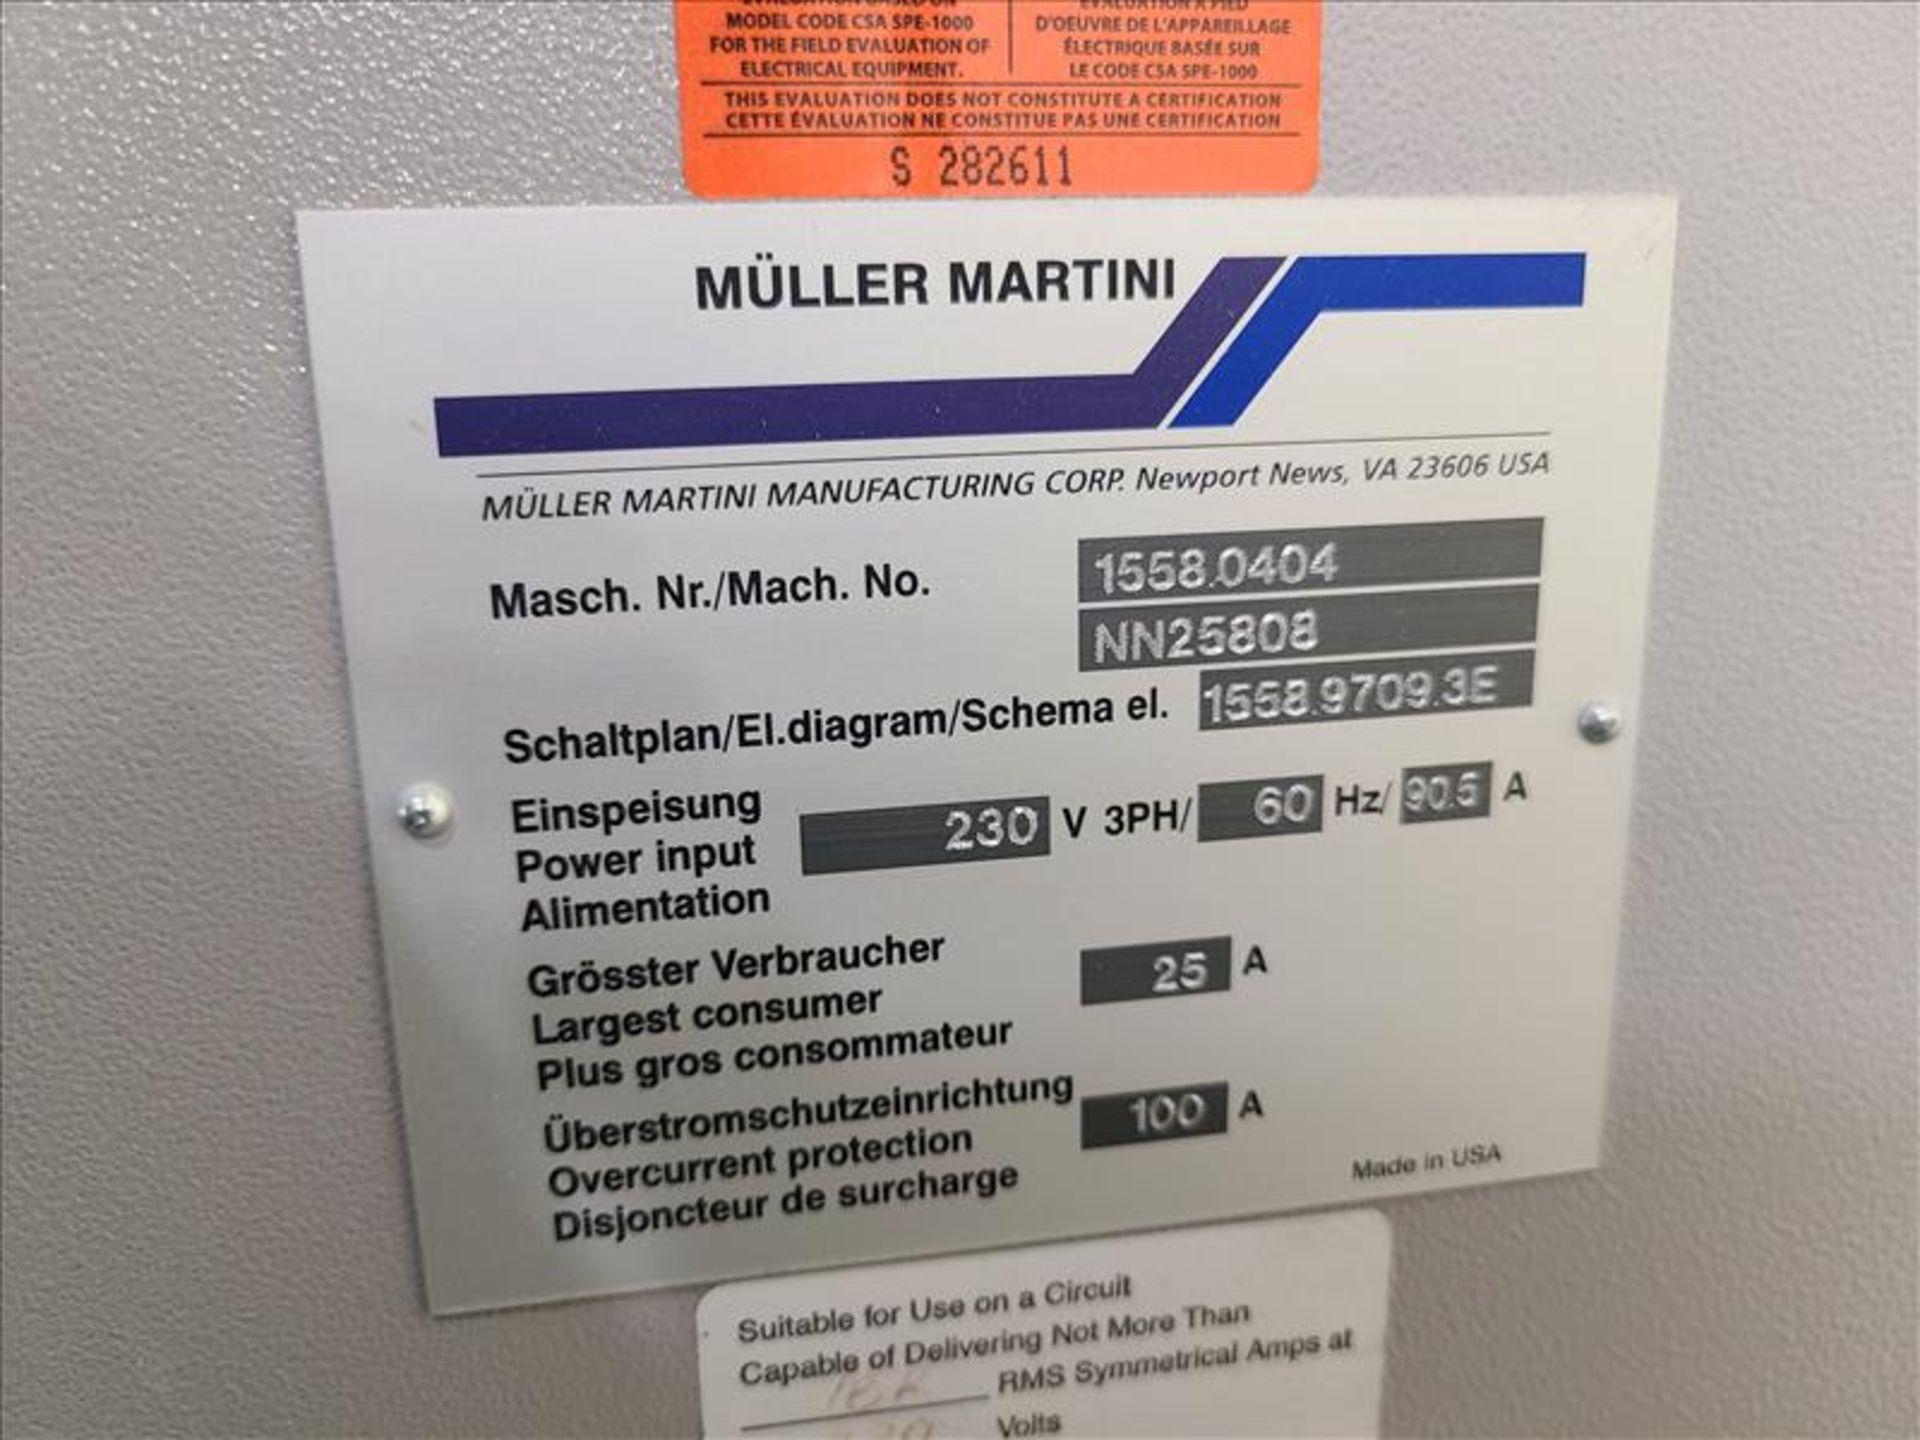 Muller Martini,Valore, 8 Station Saddle Stitcher, model 1558.0404, S/N.NN25808, 230V, 3 Phase, - Image 5 of 13